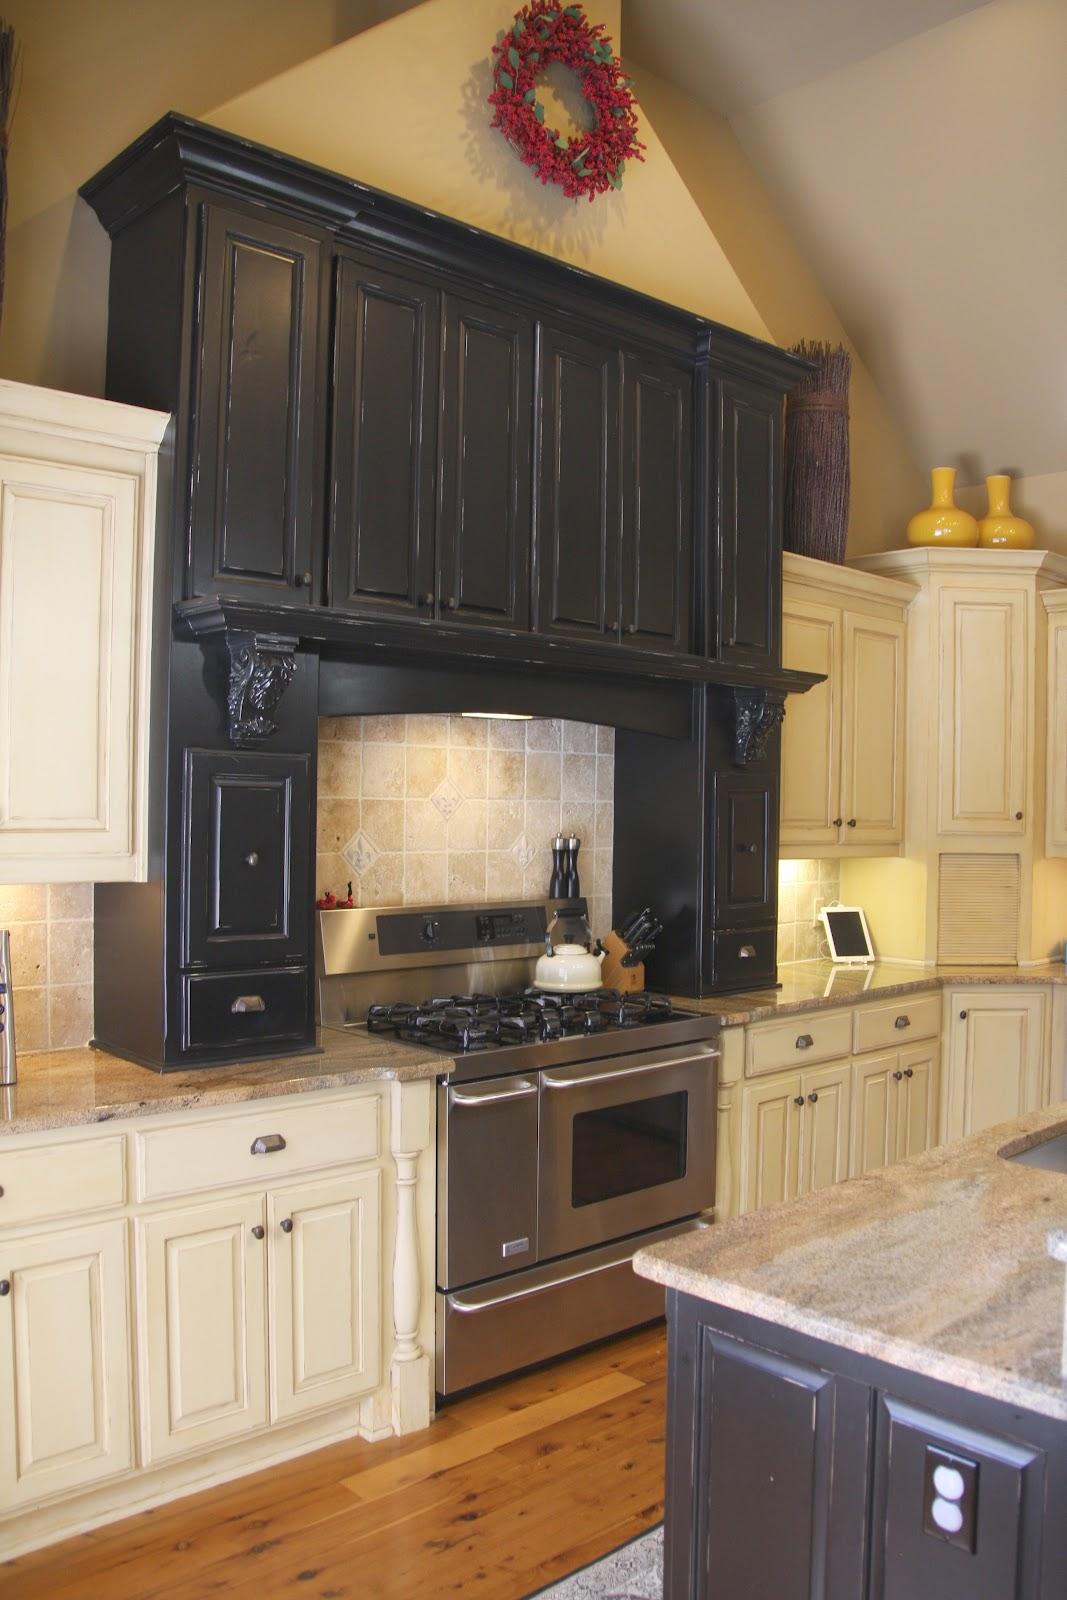 organized kitchen cabinets simply organized